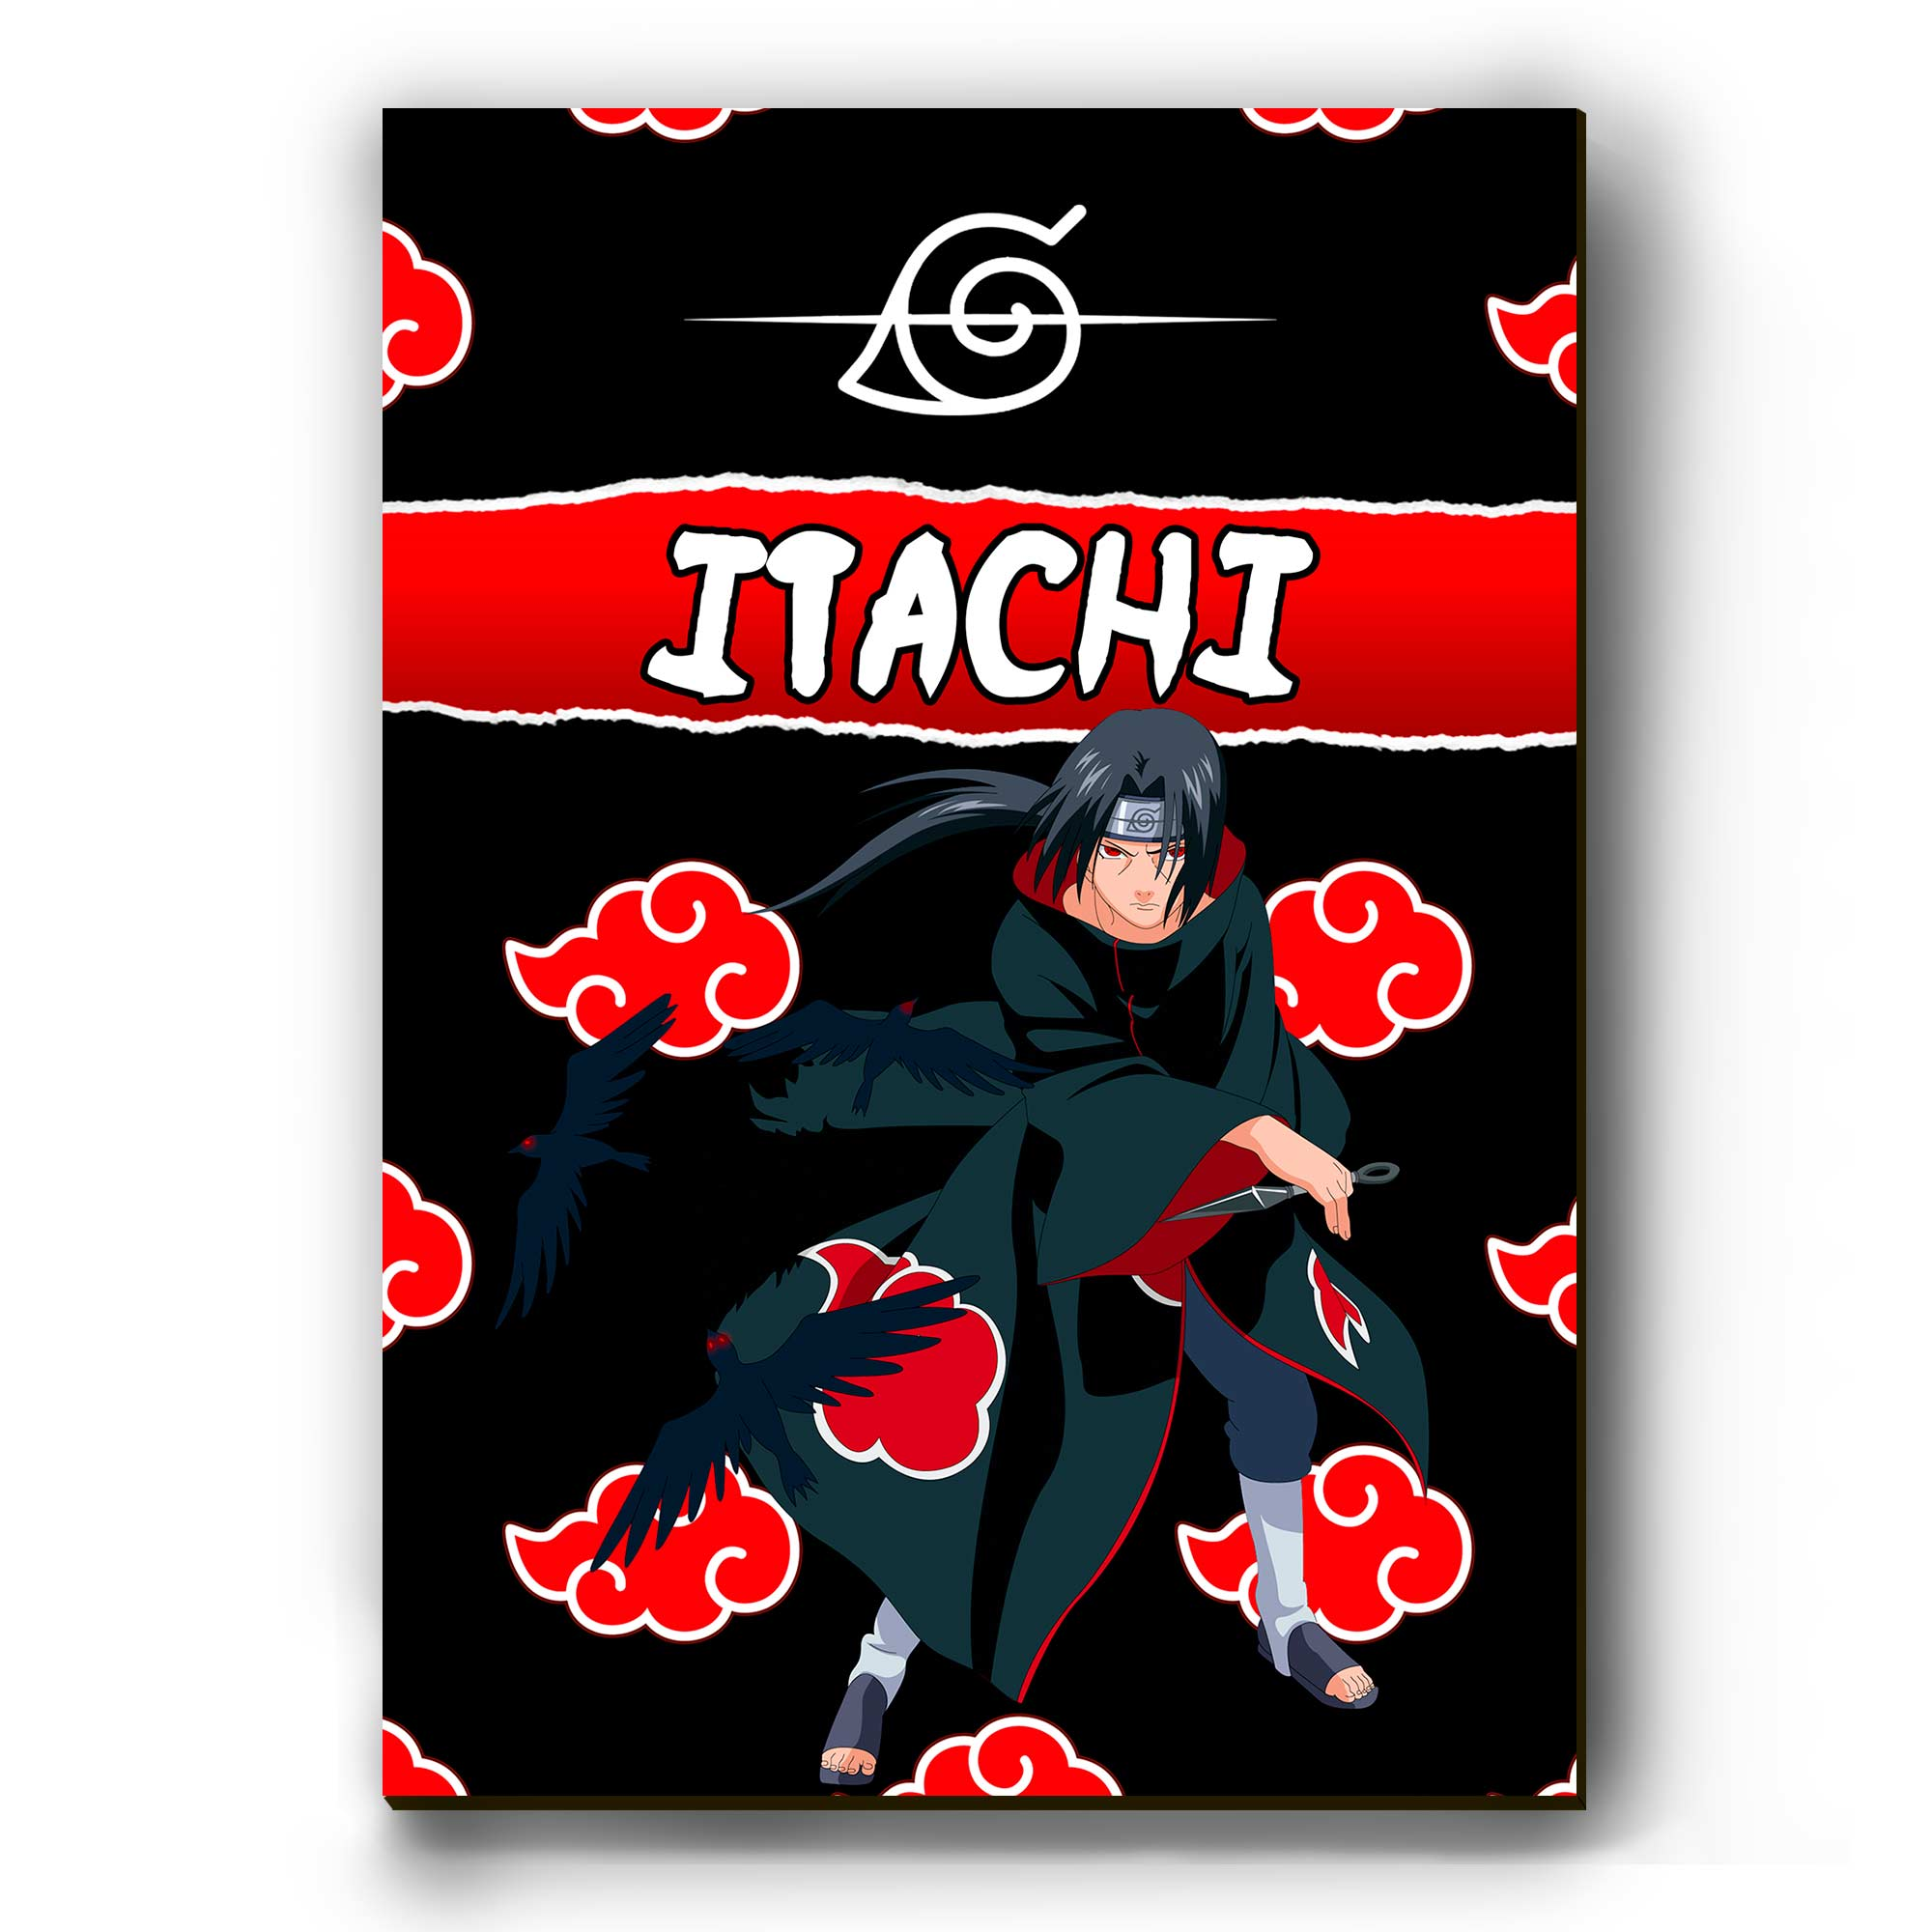 Quadro - Itachi Uchiha